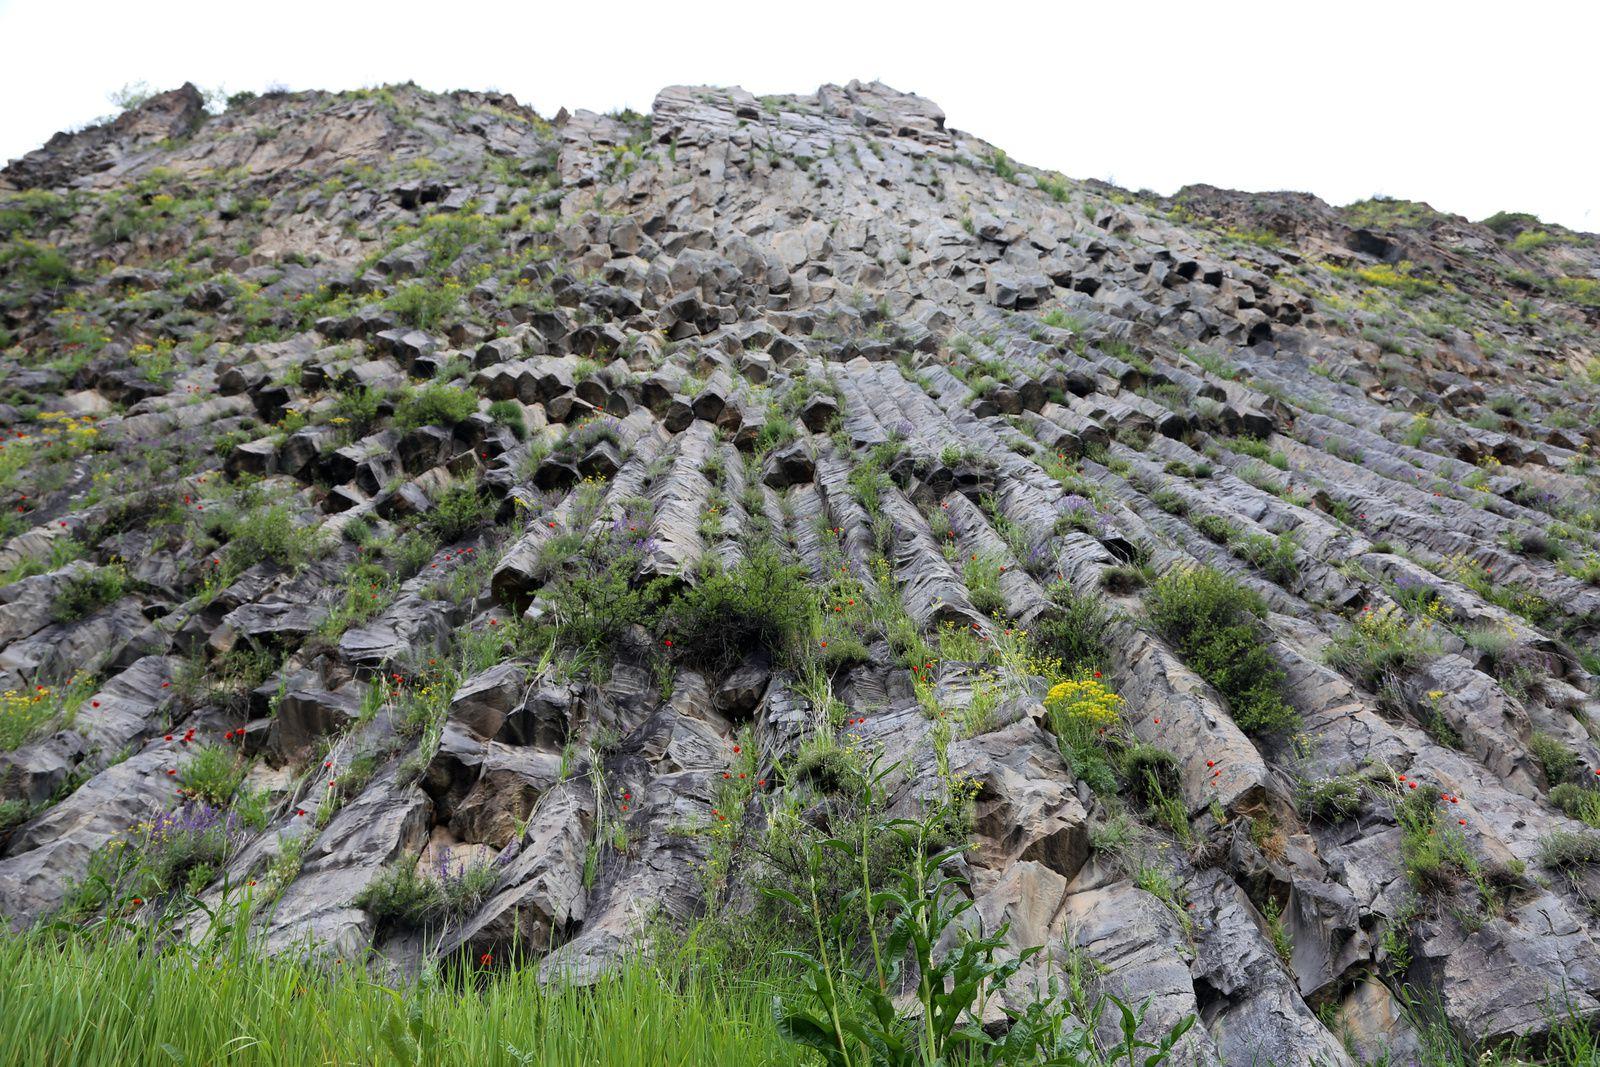 Armenia - Volcanic organs of Garni - photo © Bernard Duyck 2019